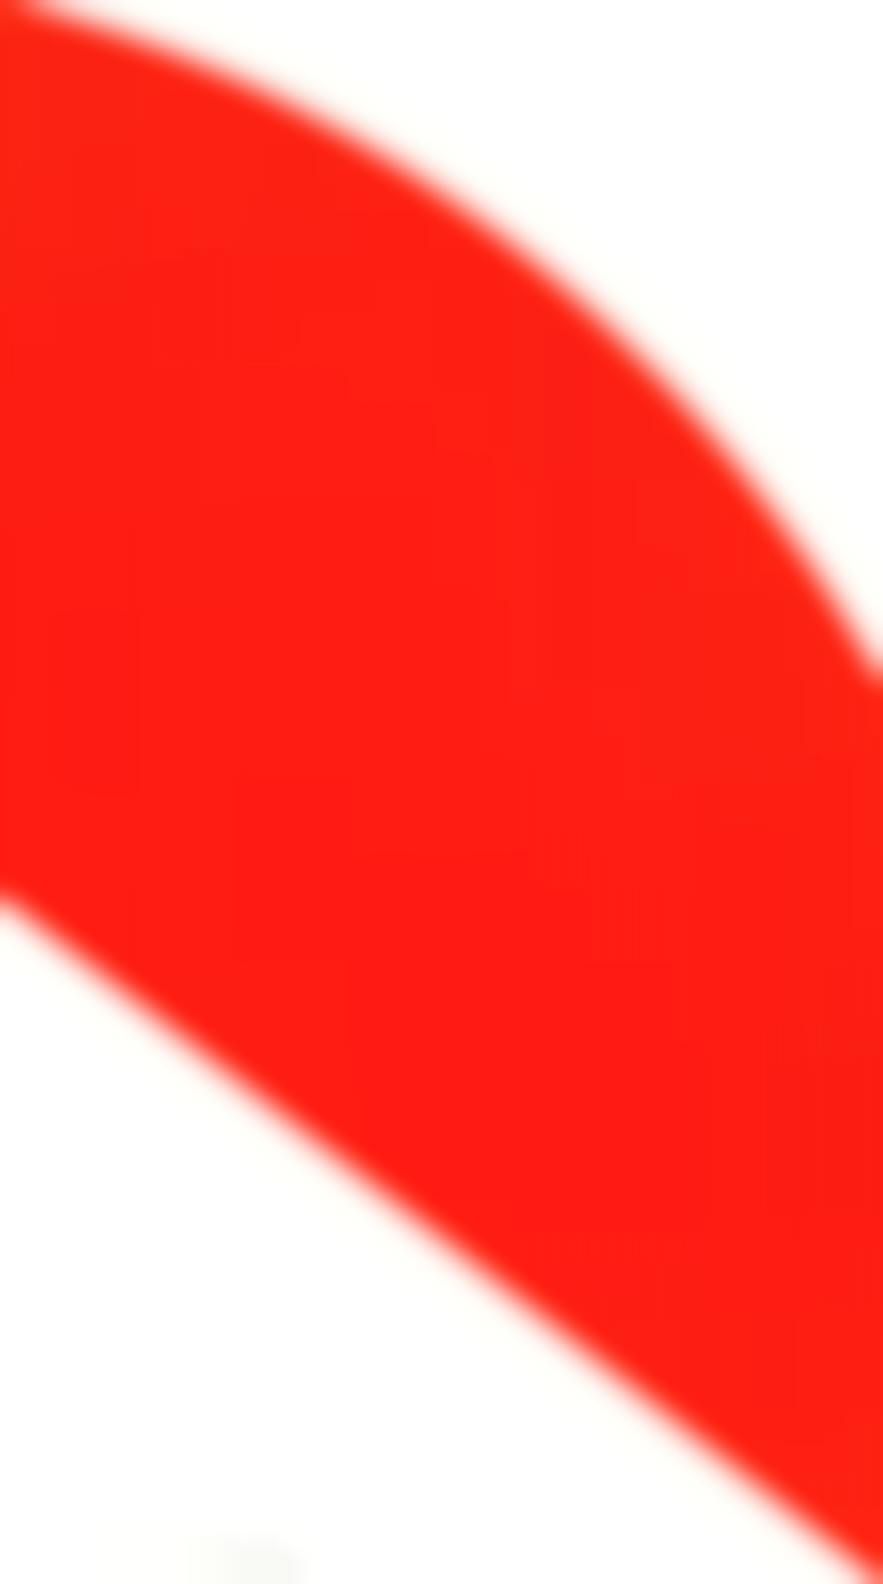 Ellsworth Kelly-Red Curve-2006